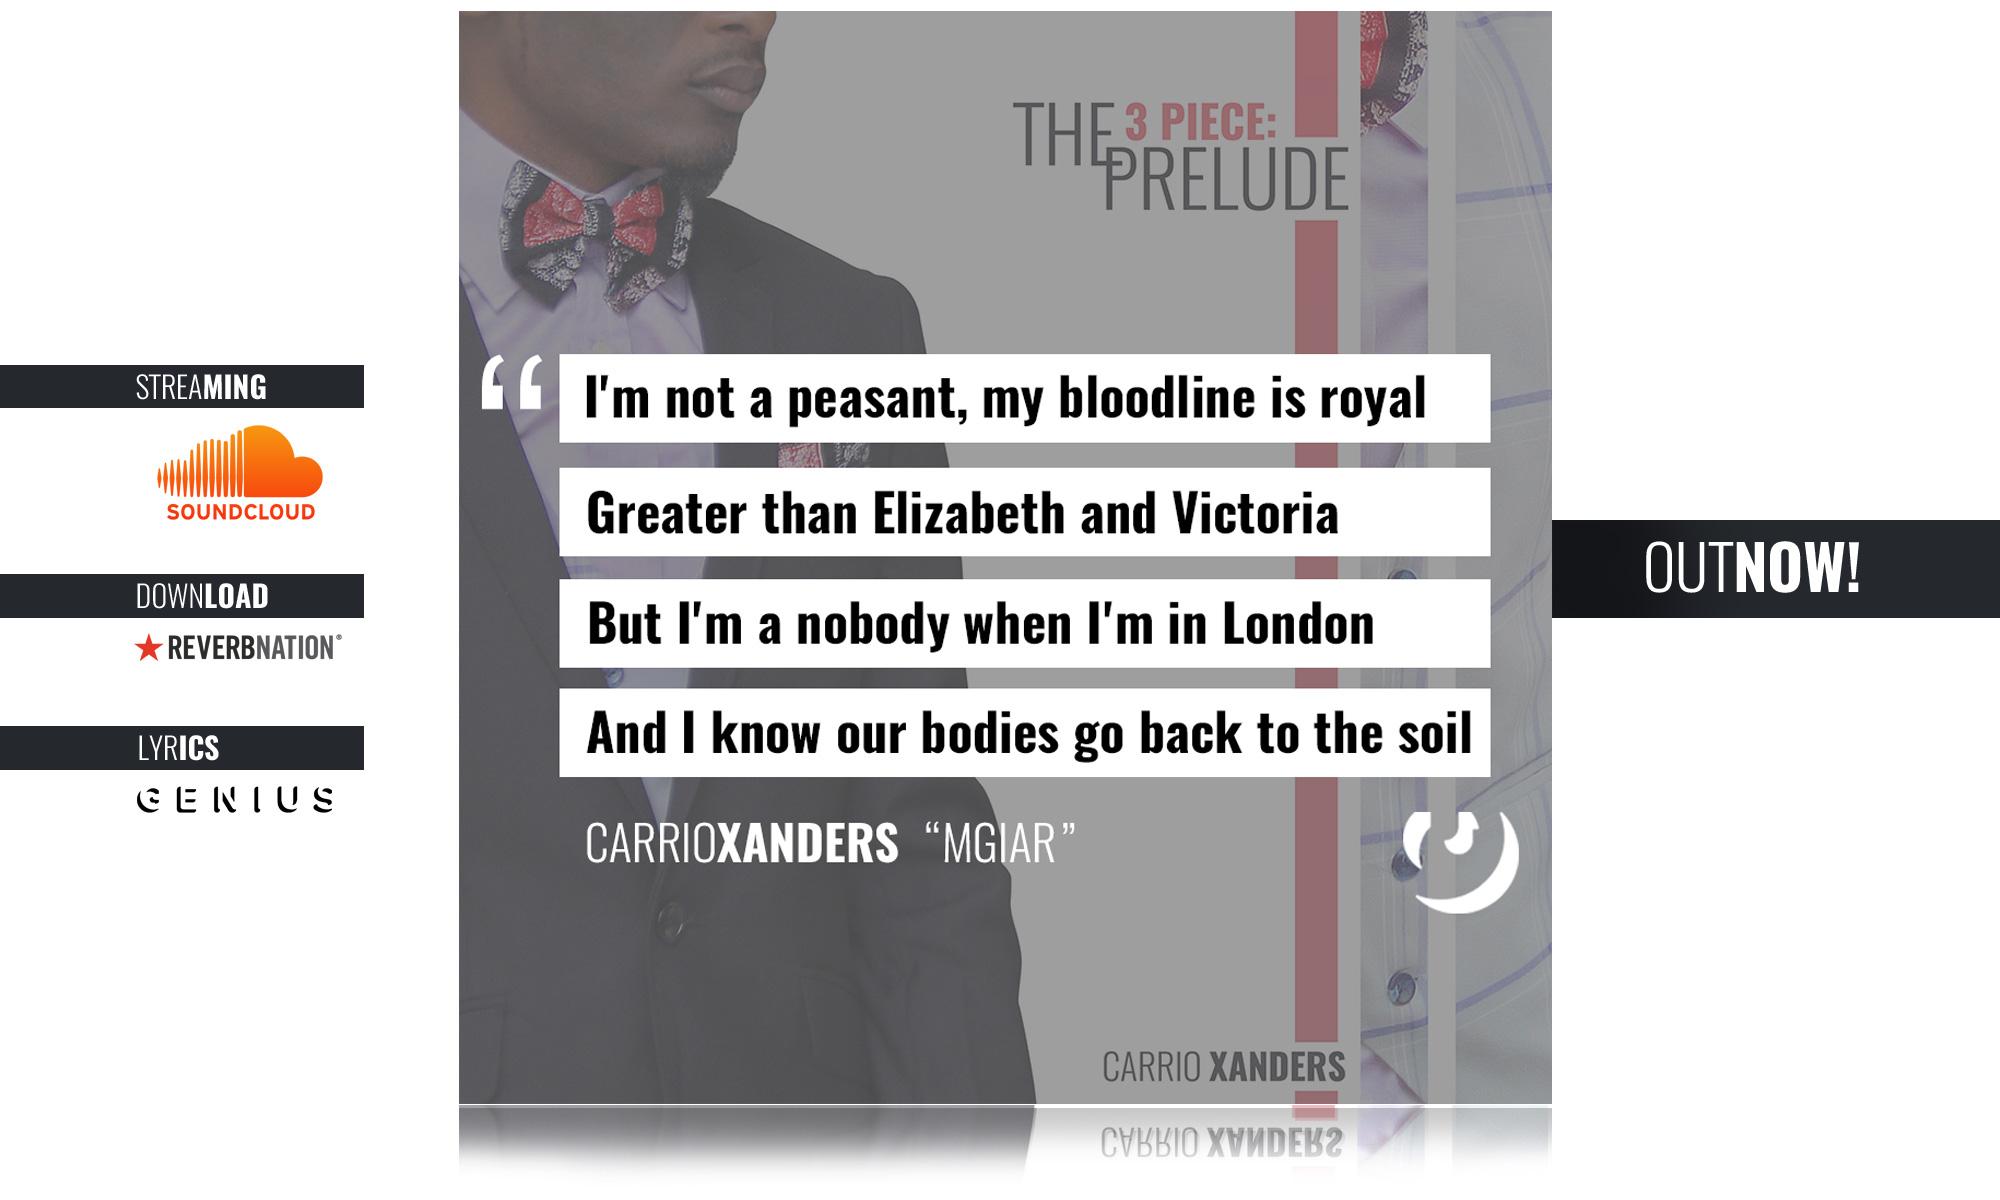 carrioxanders-theprelude-outnow-website_lyrics_MGIAR